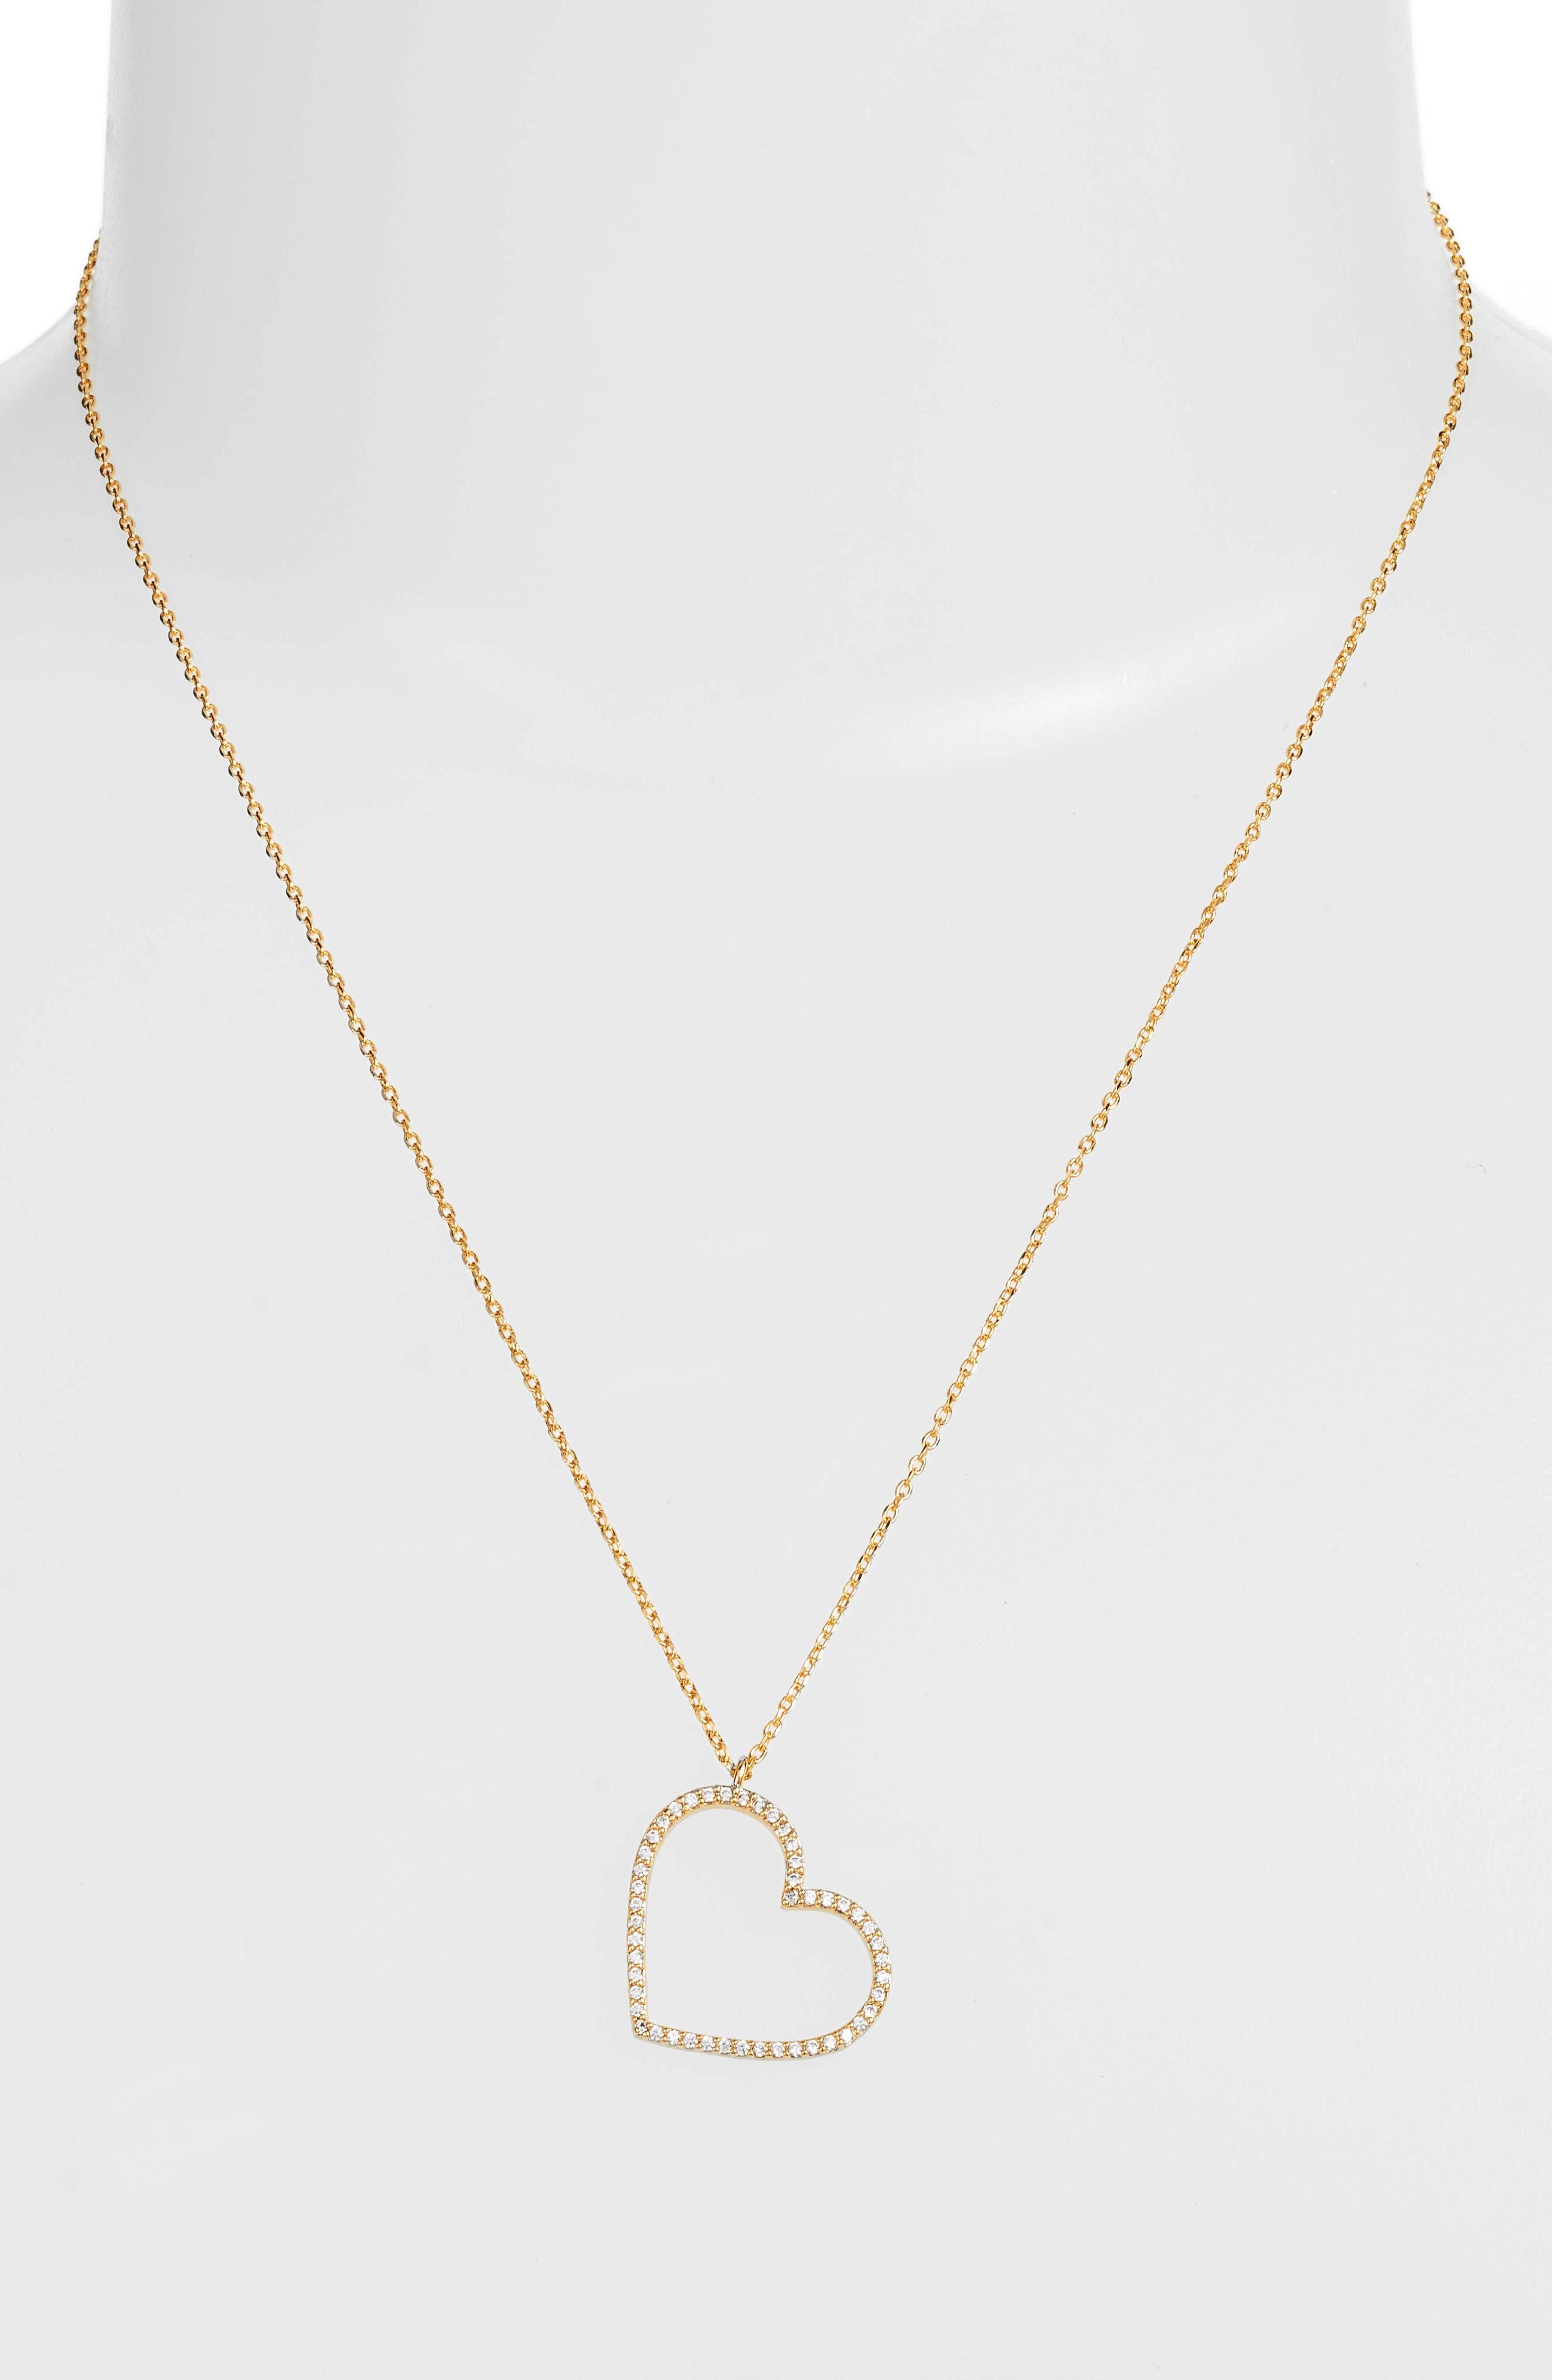 Cubic Zirconia Heart Necklace,                             Alternate thumbnail 2, color,                             GOLD